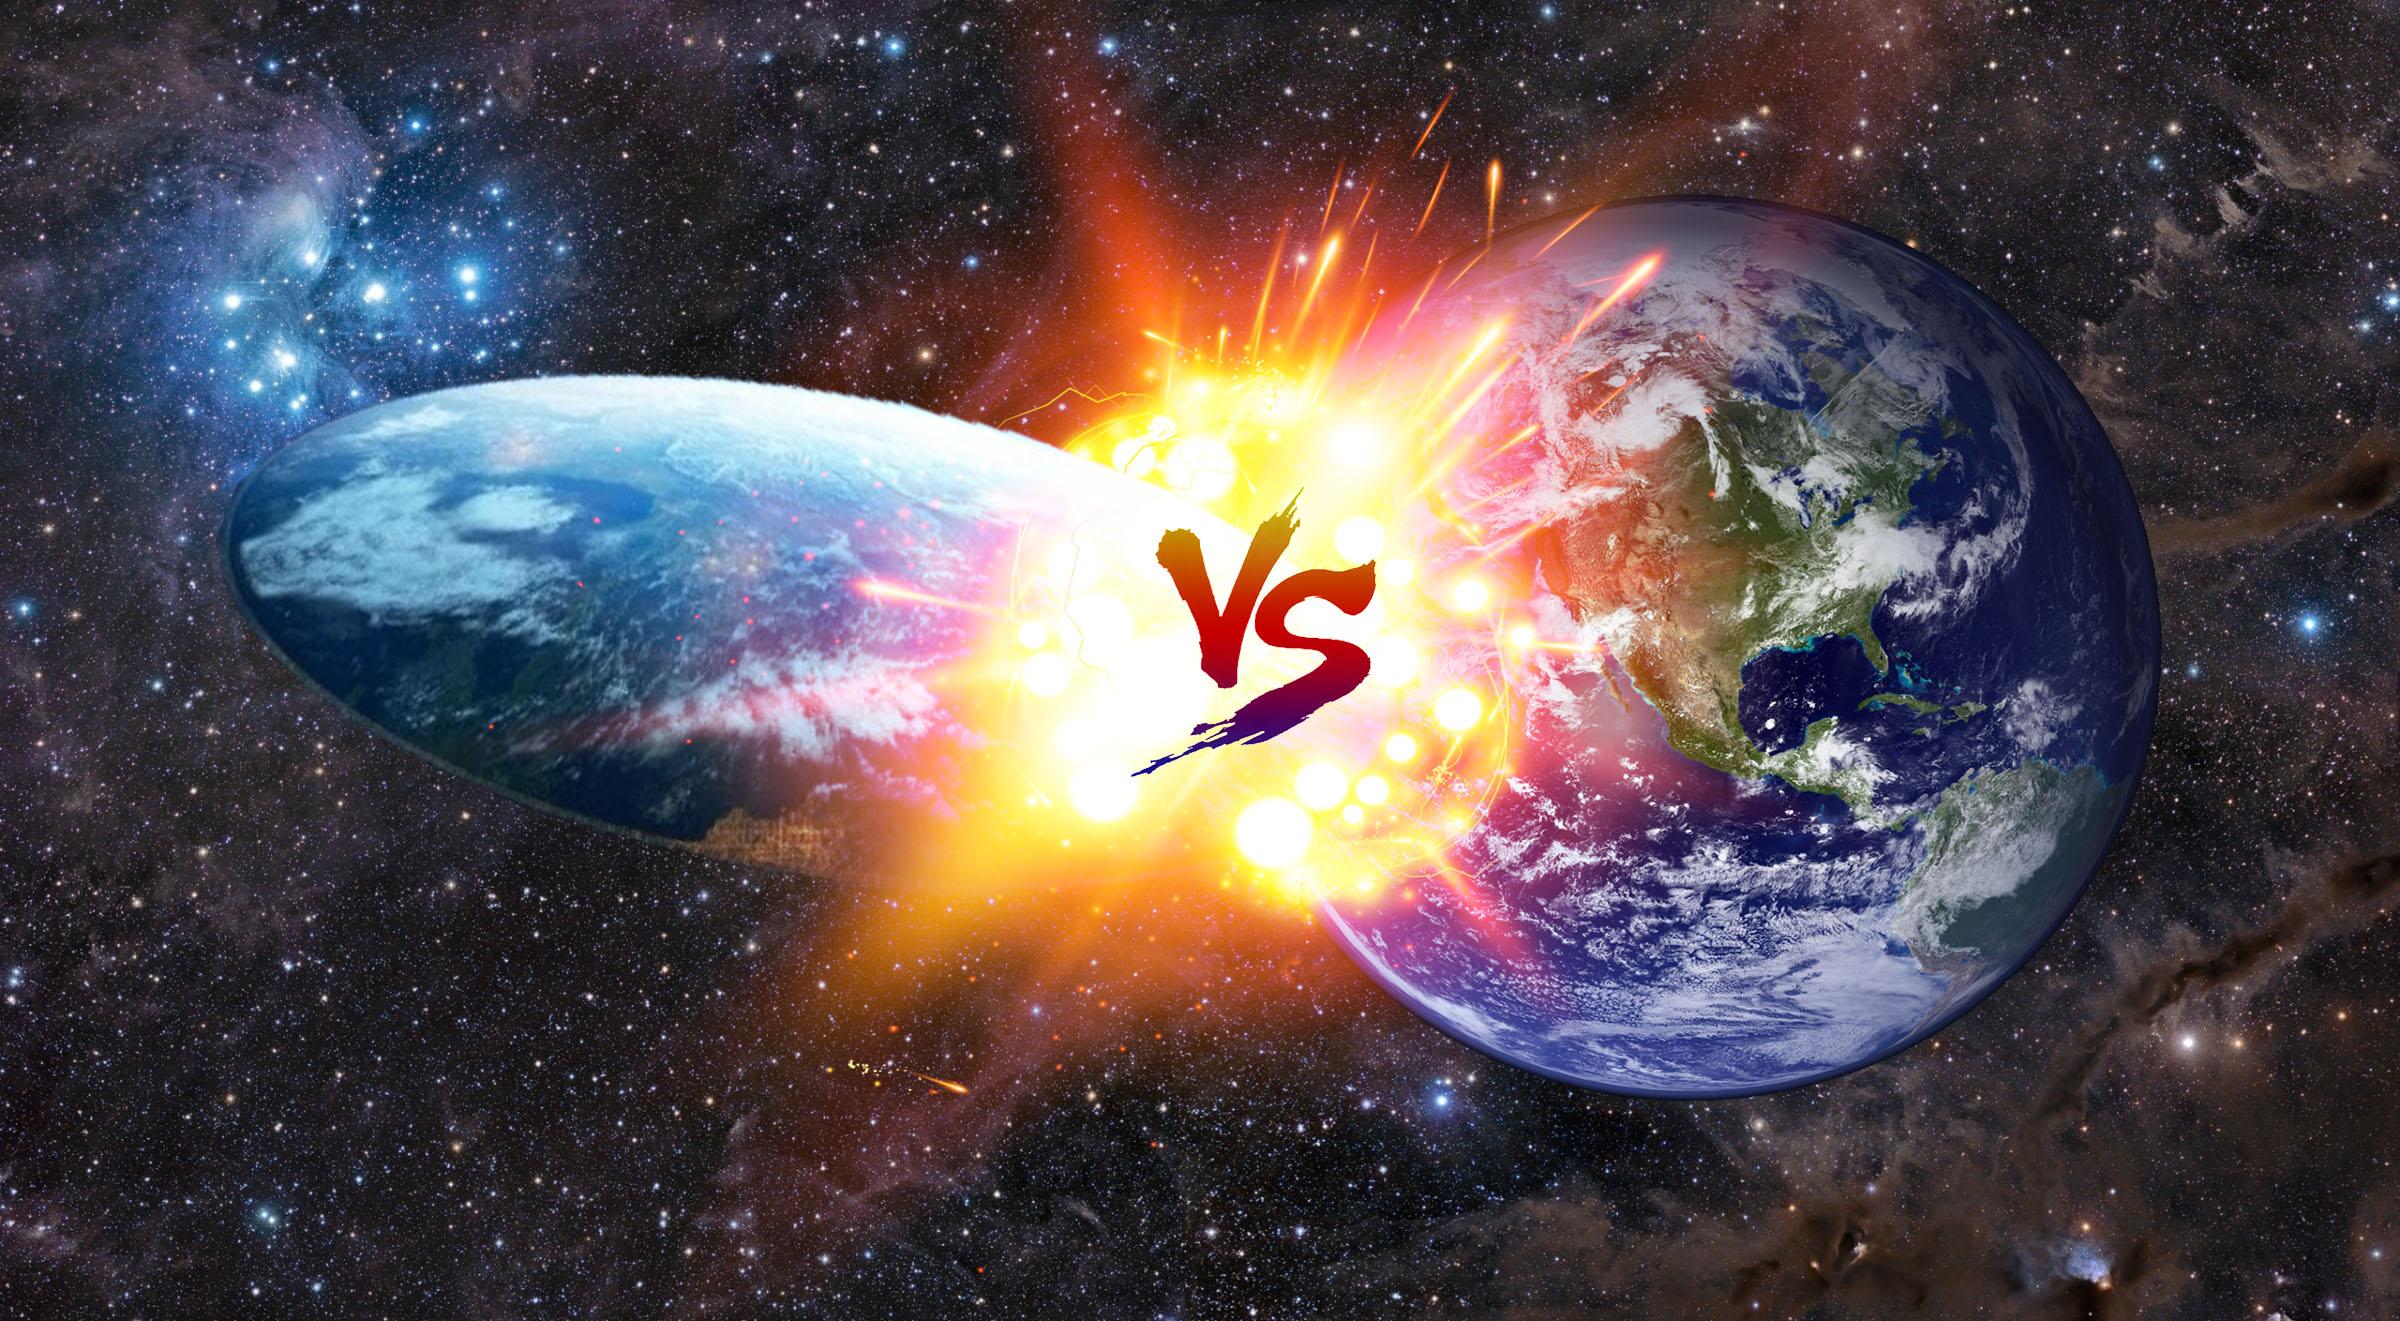 Terraplanismo-terraplanista-tierra-plana-redonda-esferica-estacionaria-estatica-sol-rotacion-orbita-fraudes-pseudociencia-engaños-ciencia-astronomia-fisica-matematicas-trigonometria-horizonte-pendulo-foucault-michelson-morley-interferometro-velocidad-luz-gravedad-eter-luminifero-paralaje-estelar-energia-potencial-gravitatoria-airy-fresnel-albert-einstein-alfred-russell-wallace-zetetica-john-hampden